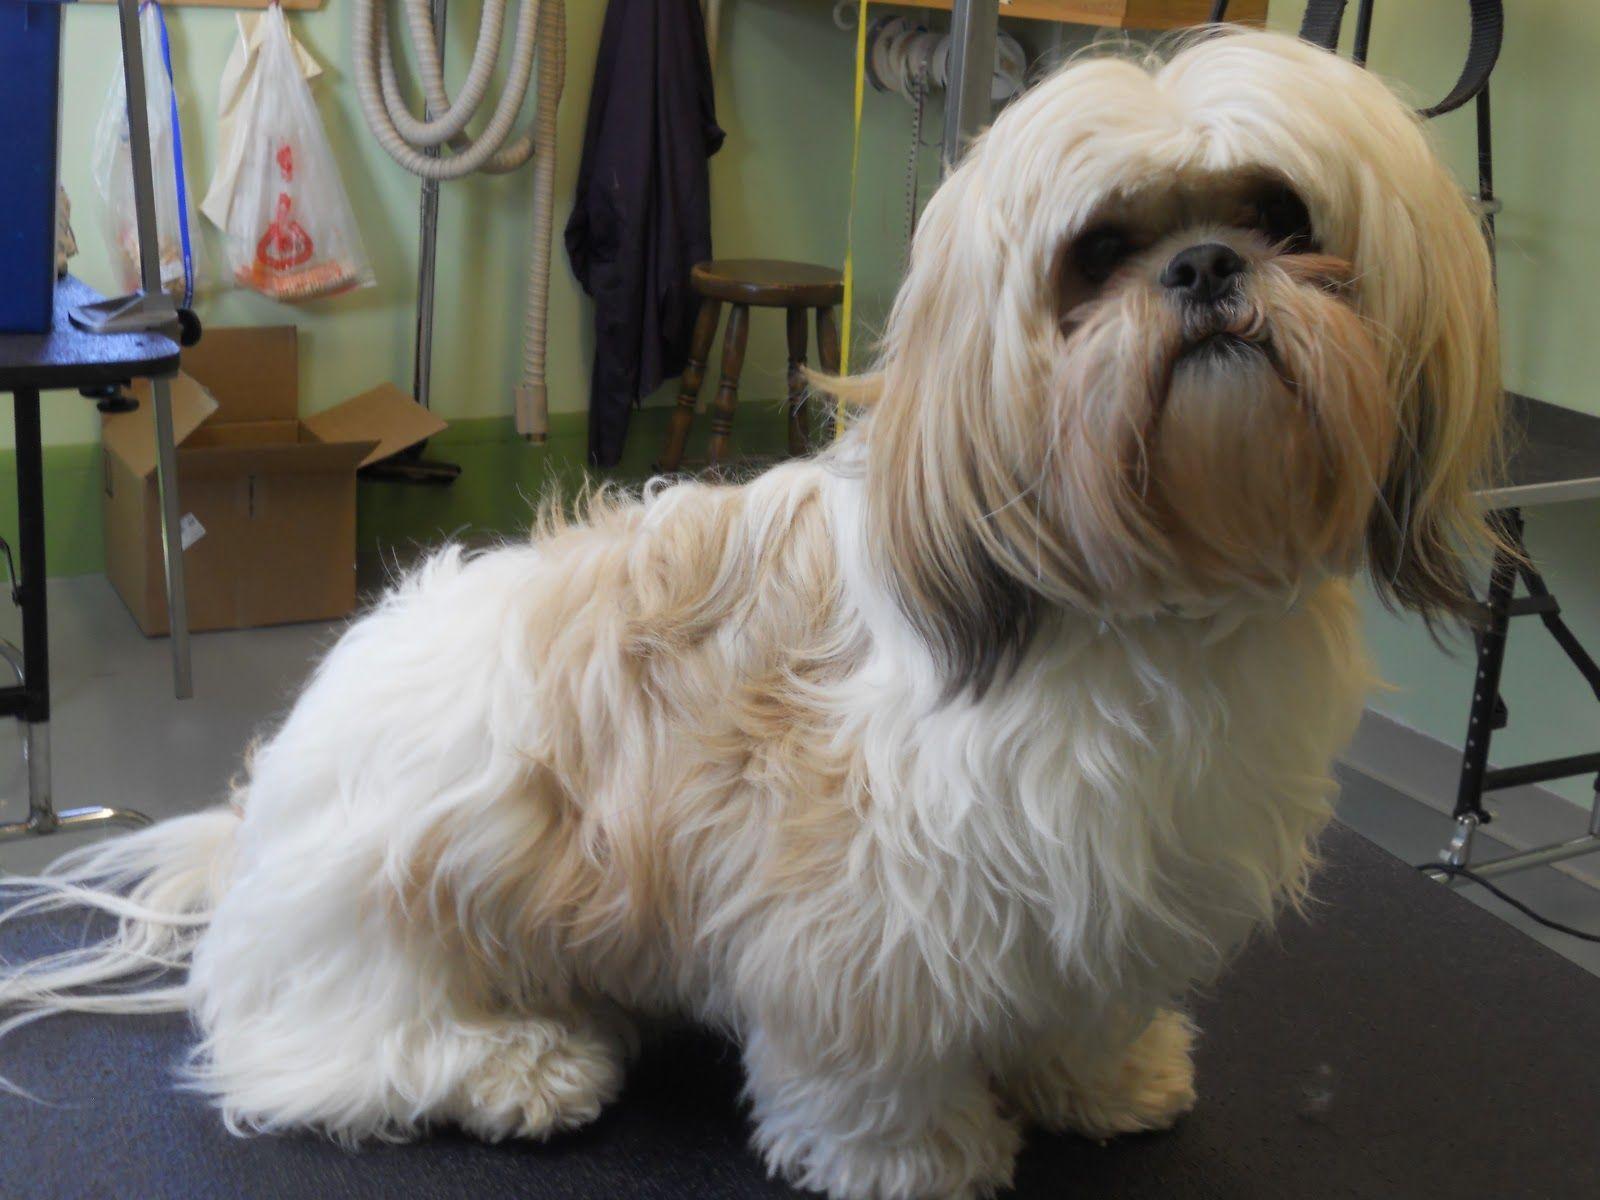 Male Shih Tzu Haircuts Hairstyle Gallery Shih Tzu Haircuts Shih Tzu Poodle Mix Puppies